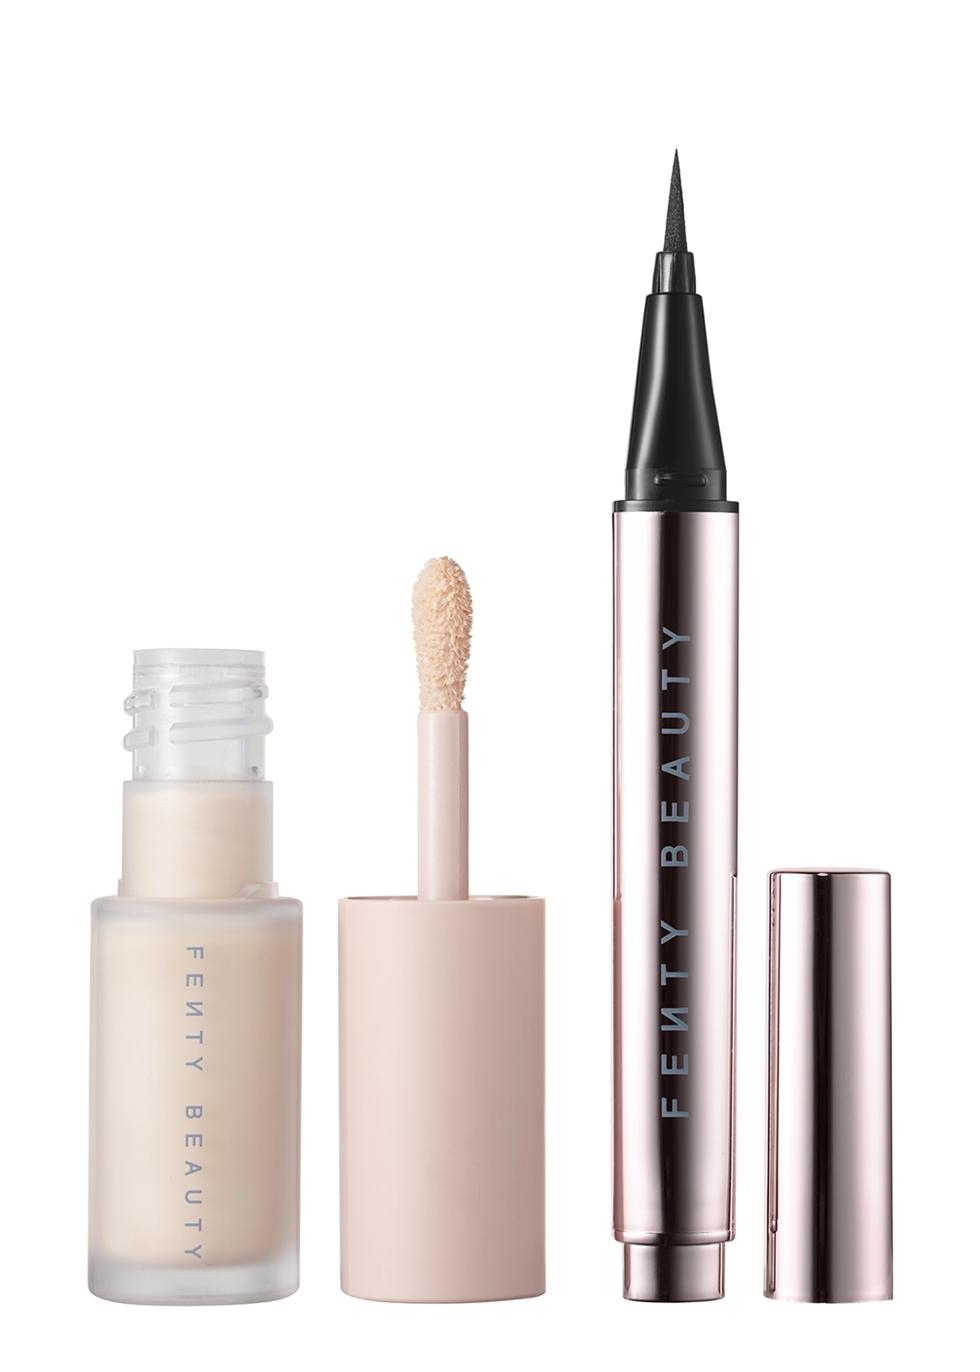 4a1ff45aec8 Designer Eye Makeup & Cosmetics - Harvey Nichols